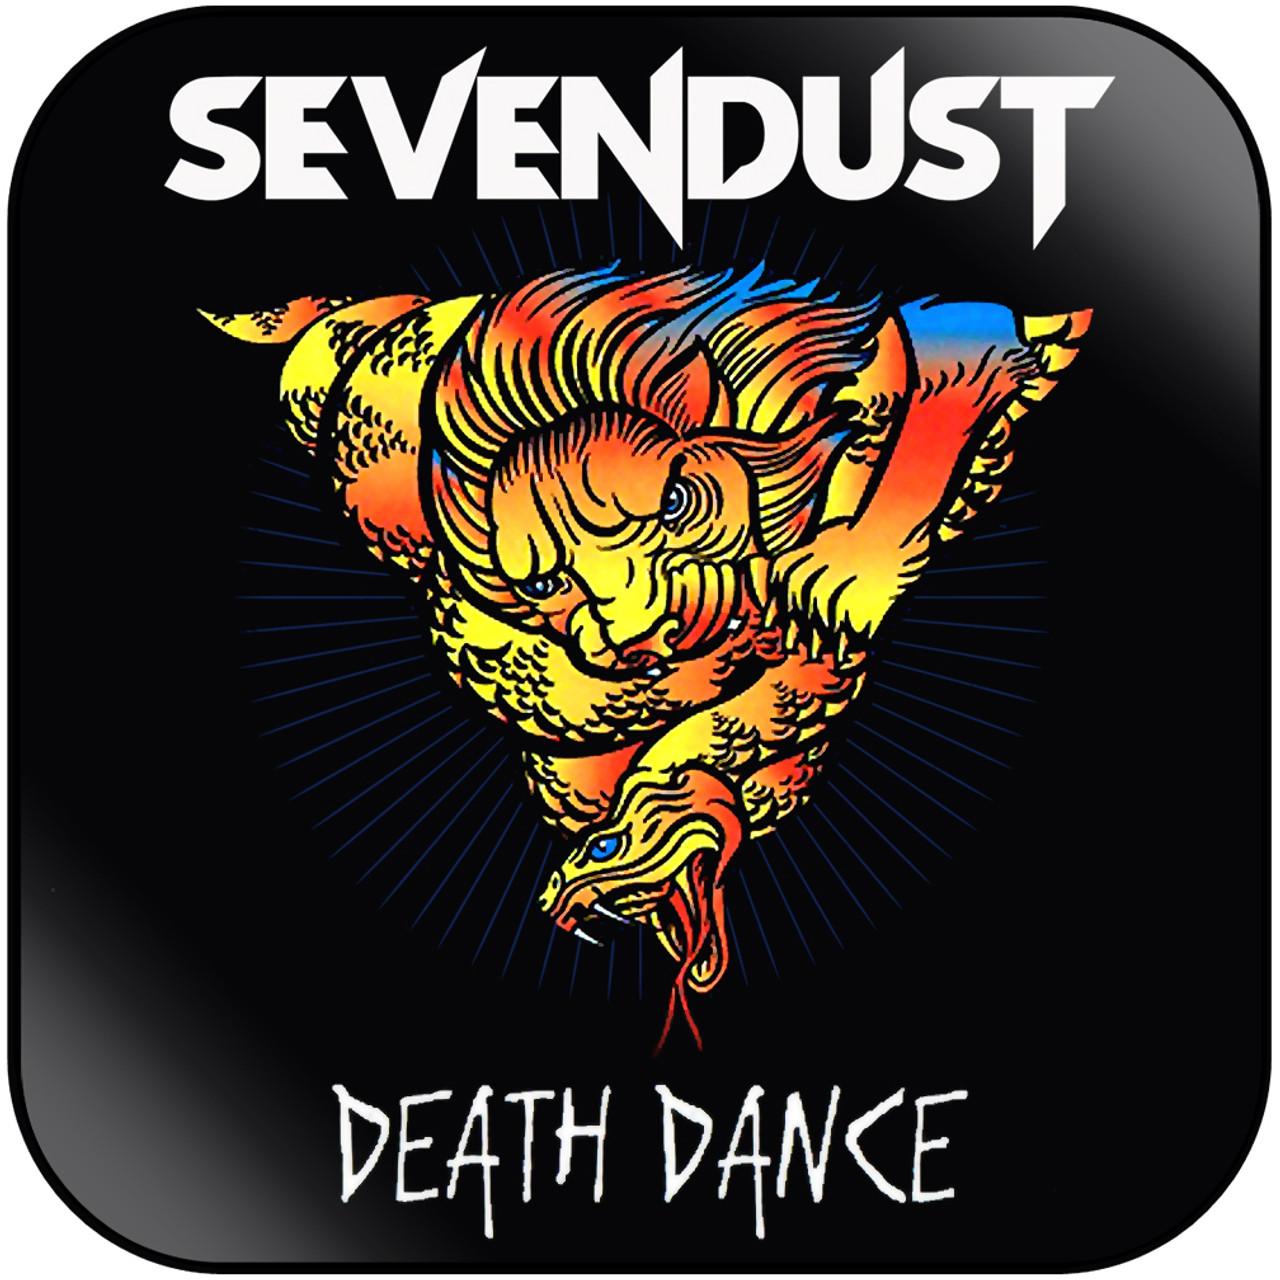 Sevendust - Death Dance Album Cover Sticker